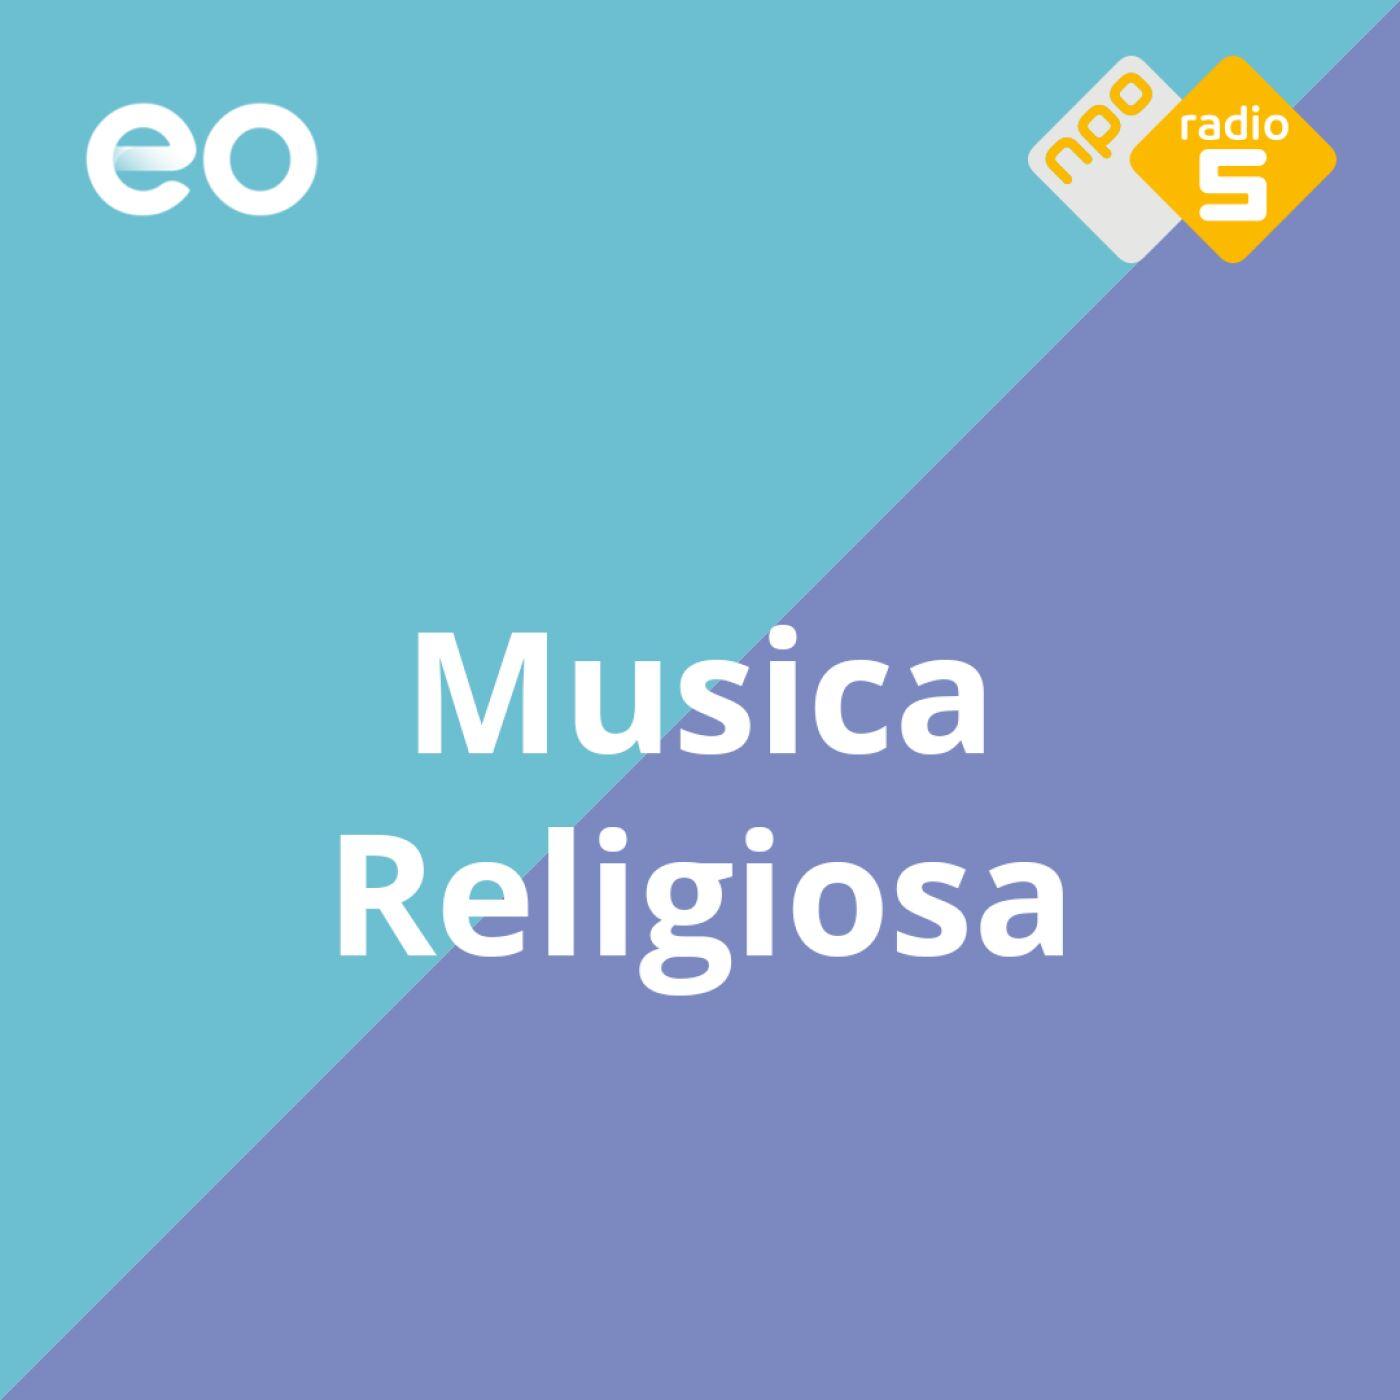 Musica Religiosa logo